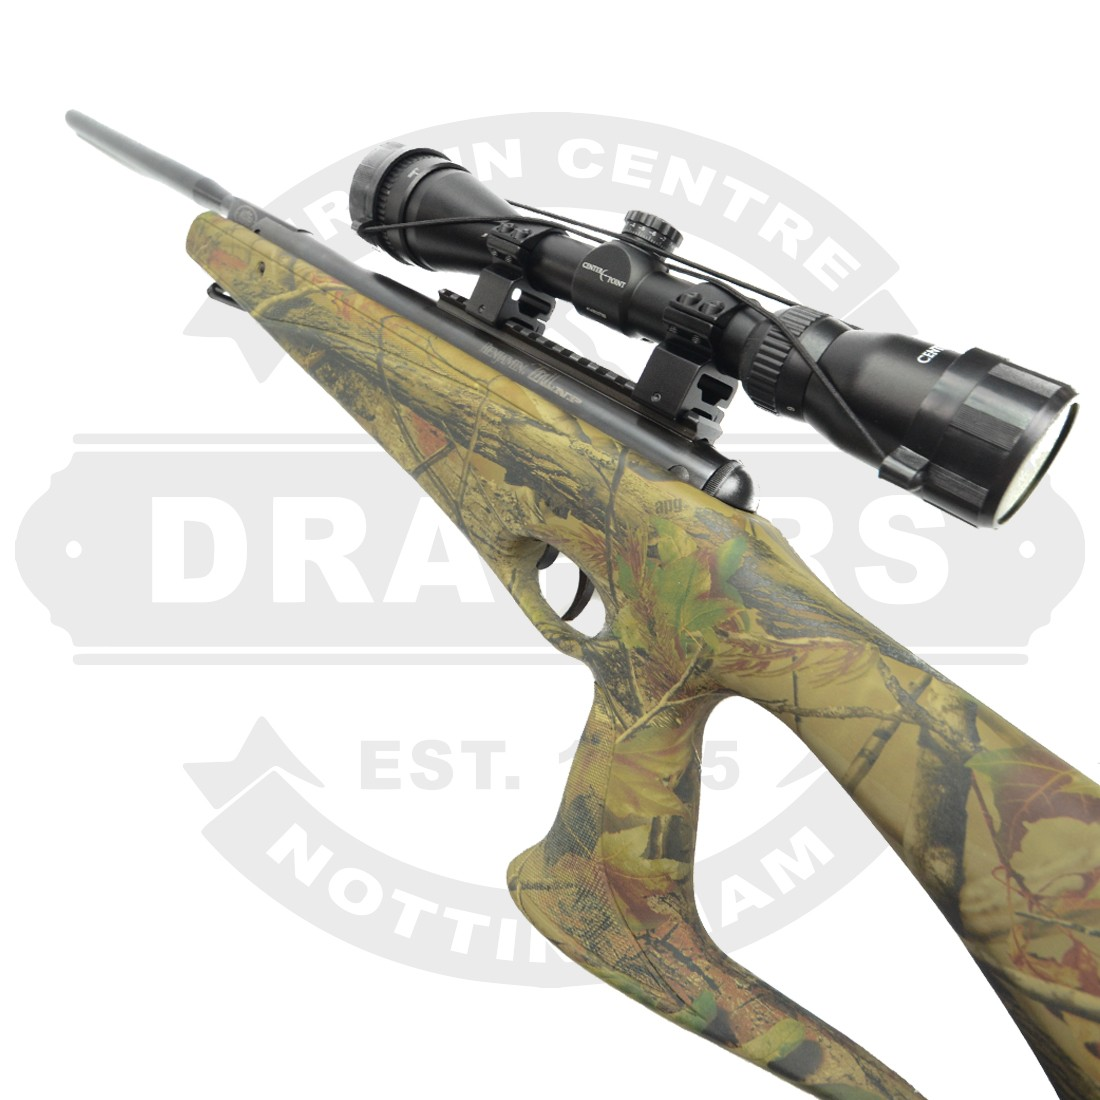 Benjamin Trail Nitro Piston Camo APG Stock  22 - Air Rifles New